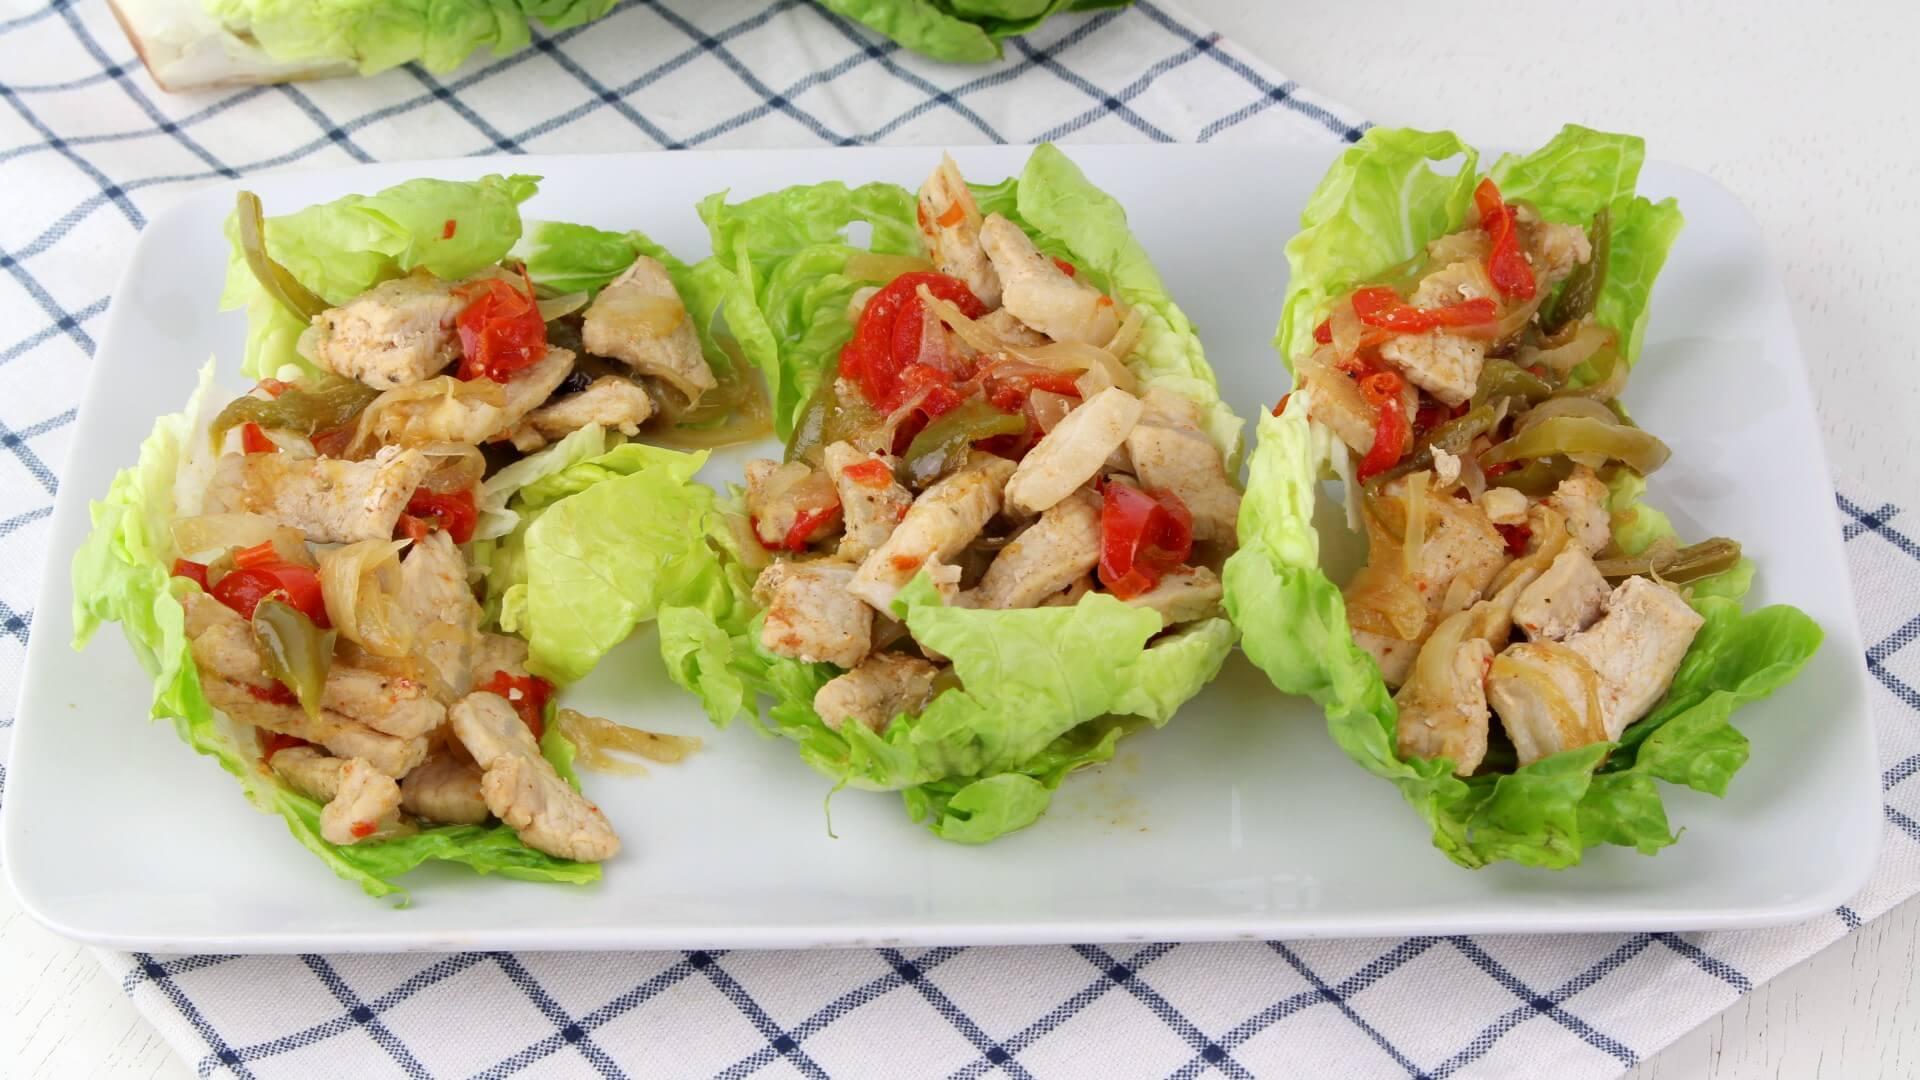 Tacos de lechuga con cerdo picante